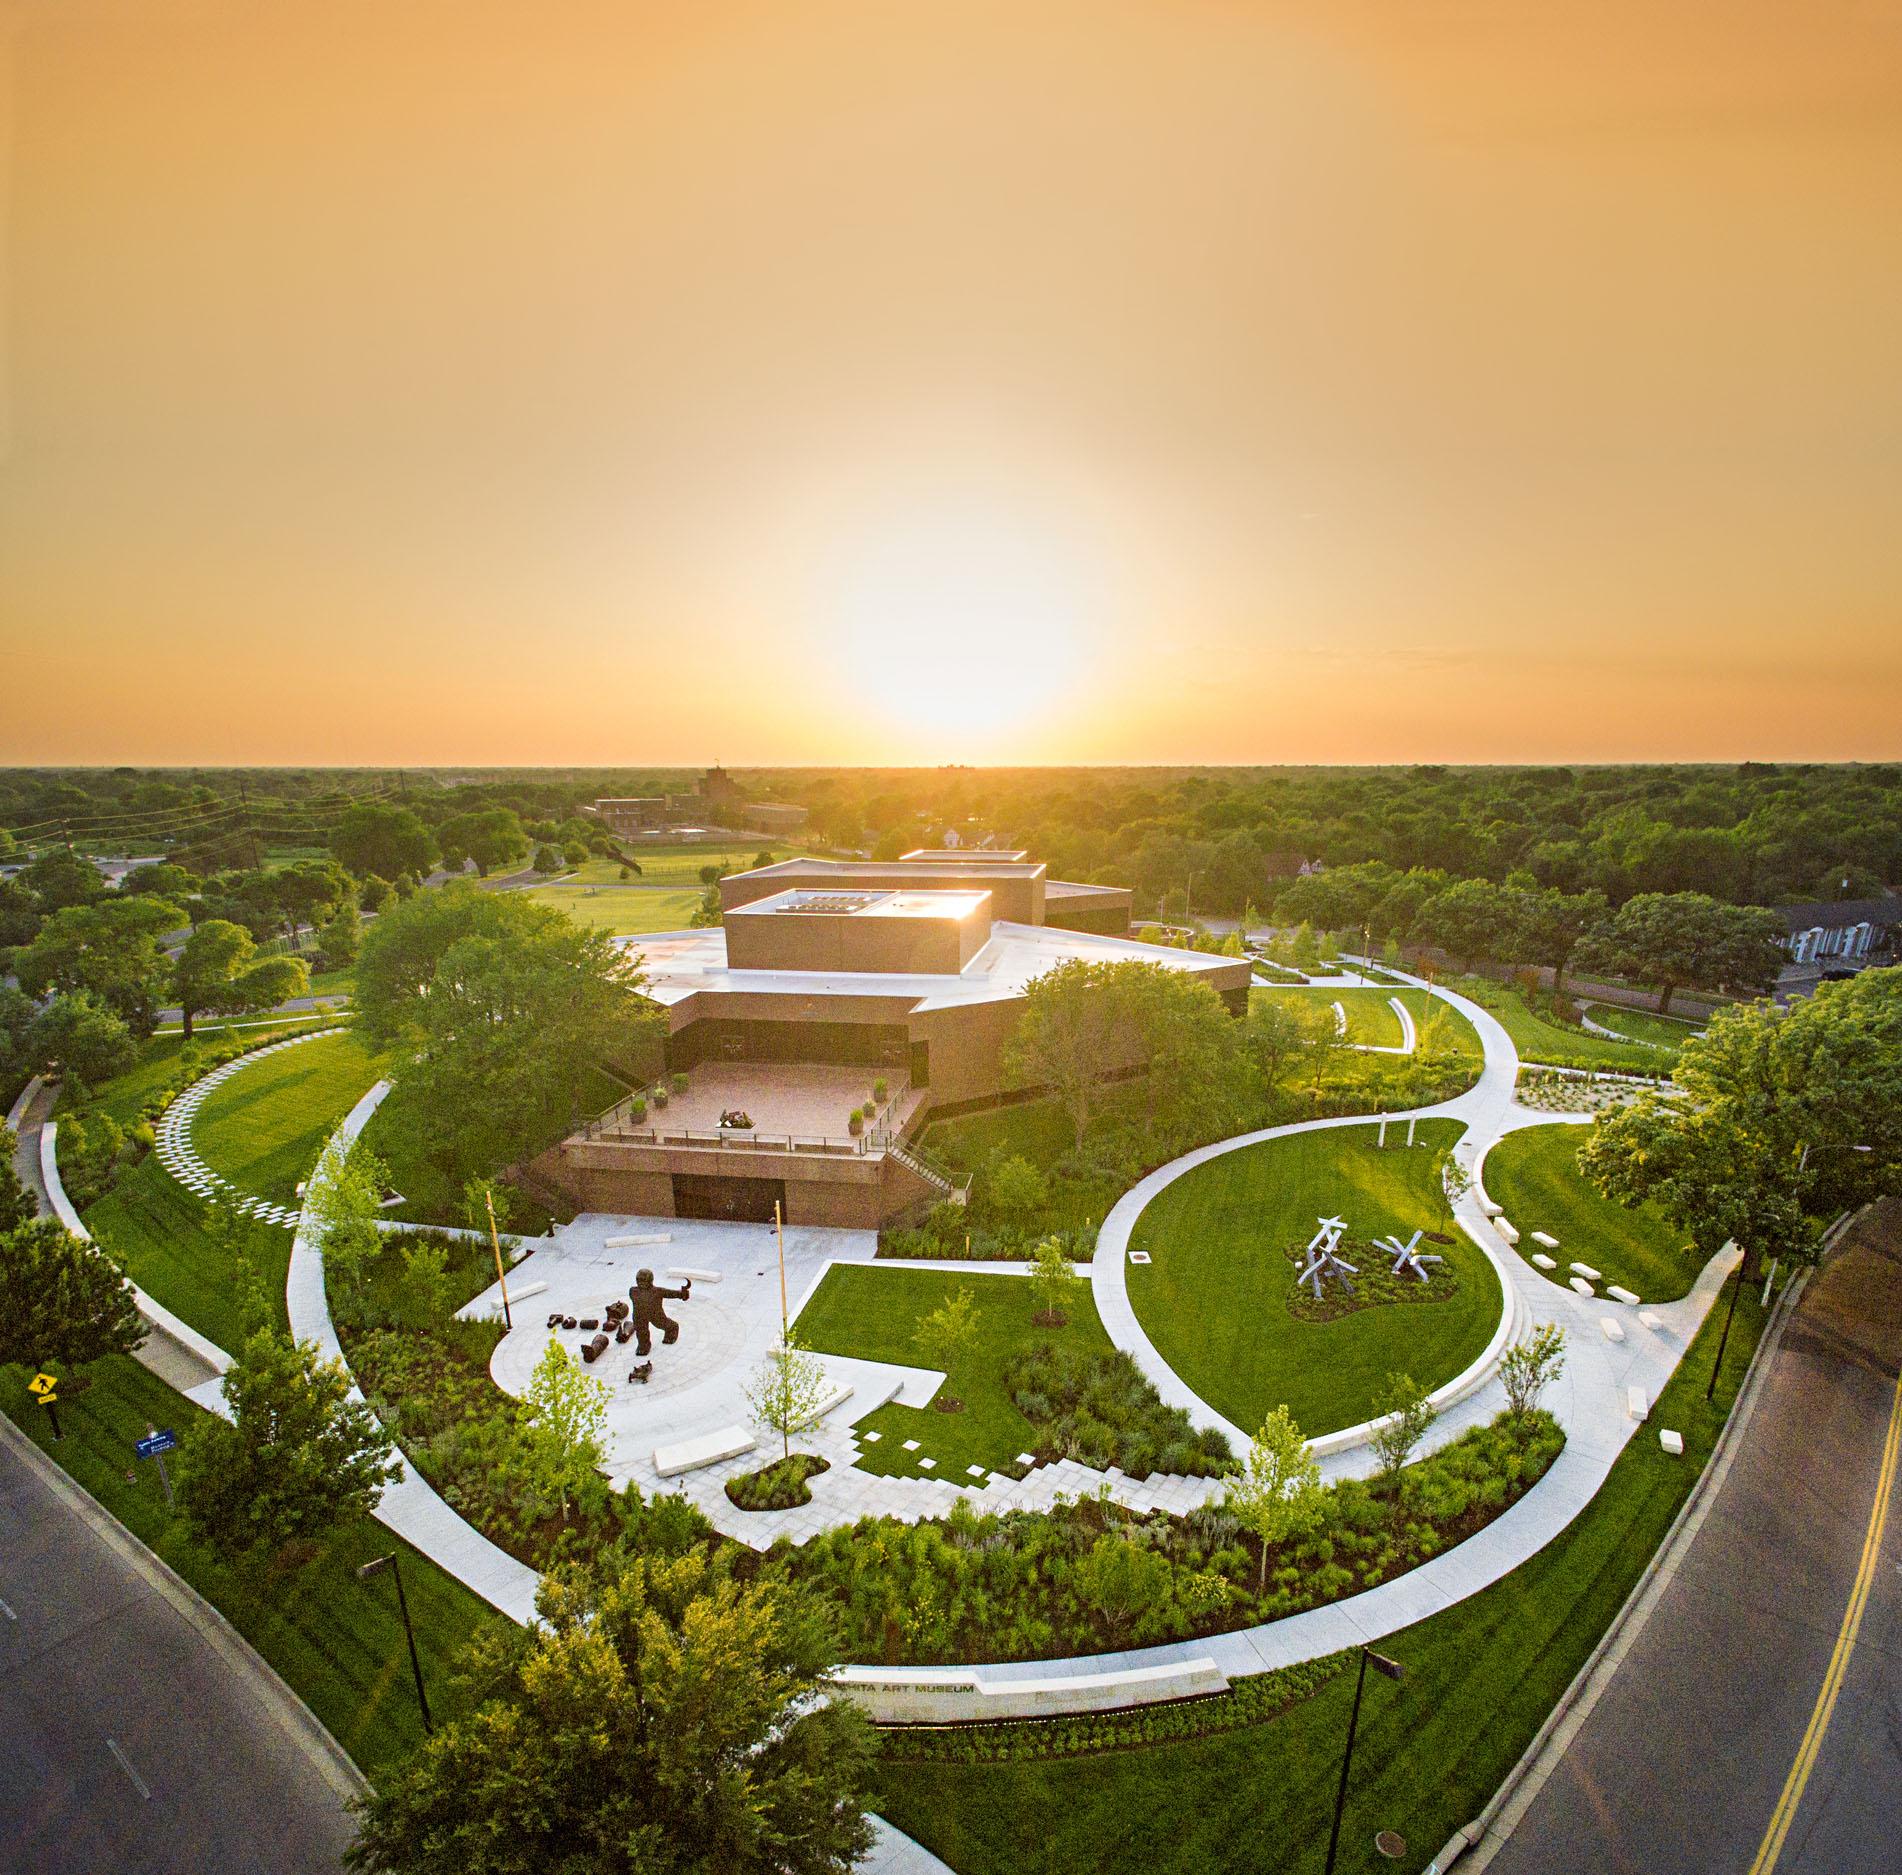 Wichita Art Museum's Art Garden